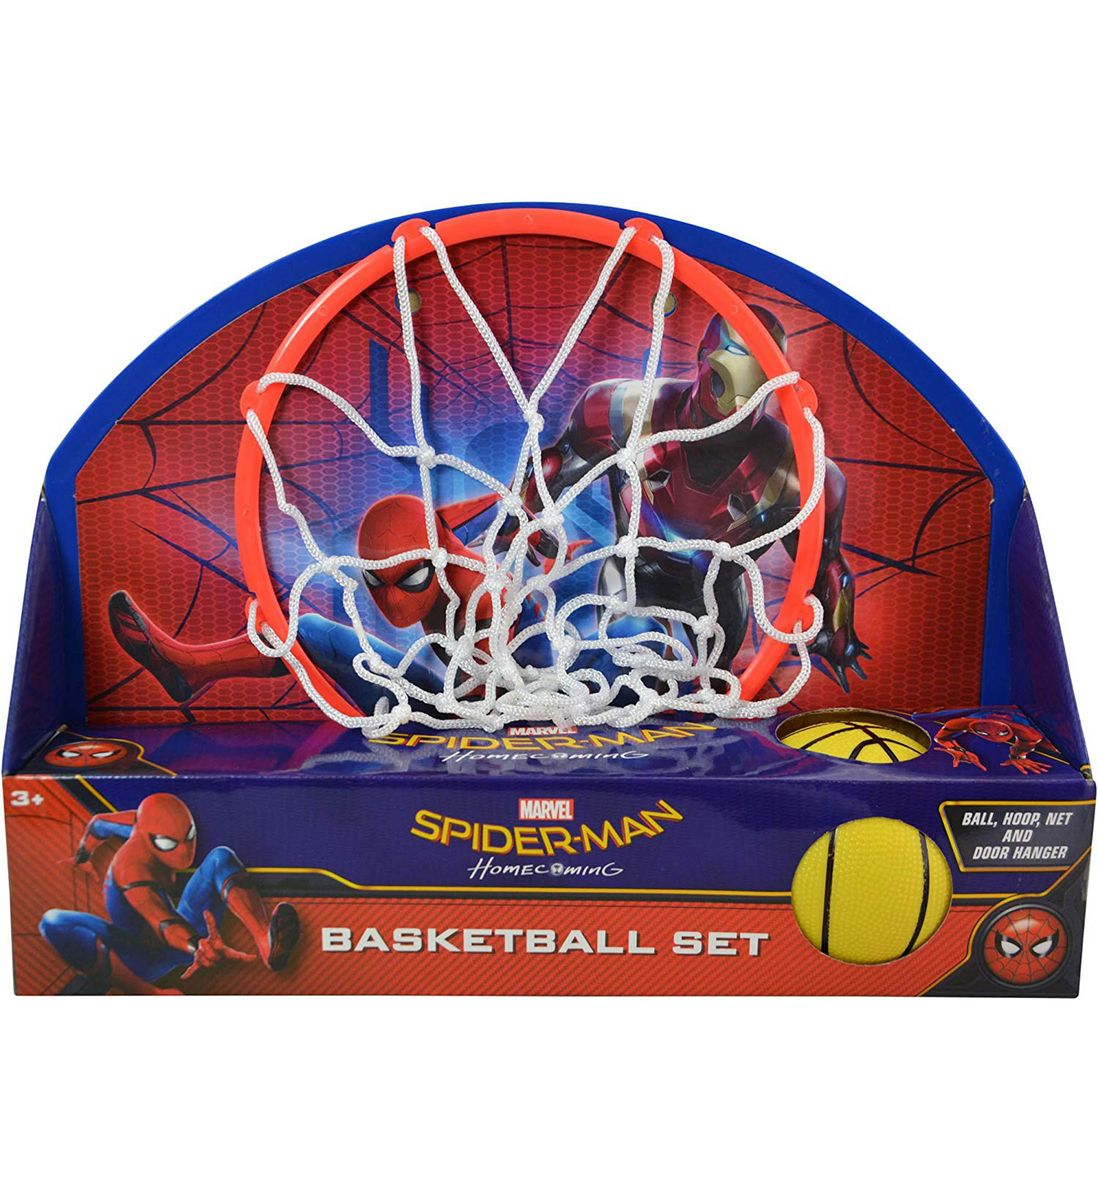 Marvel Marvel Comics Spider-Man Homecoming Basketball Set (4pc Set) Sports Accessories